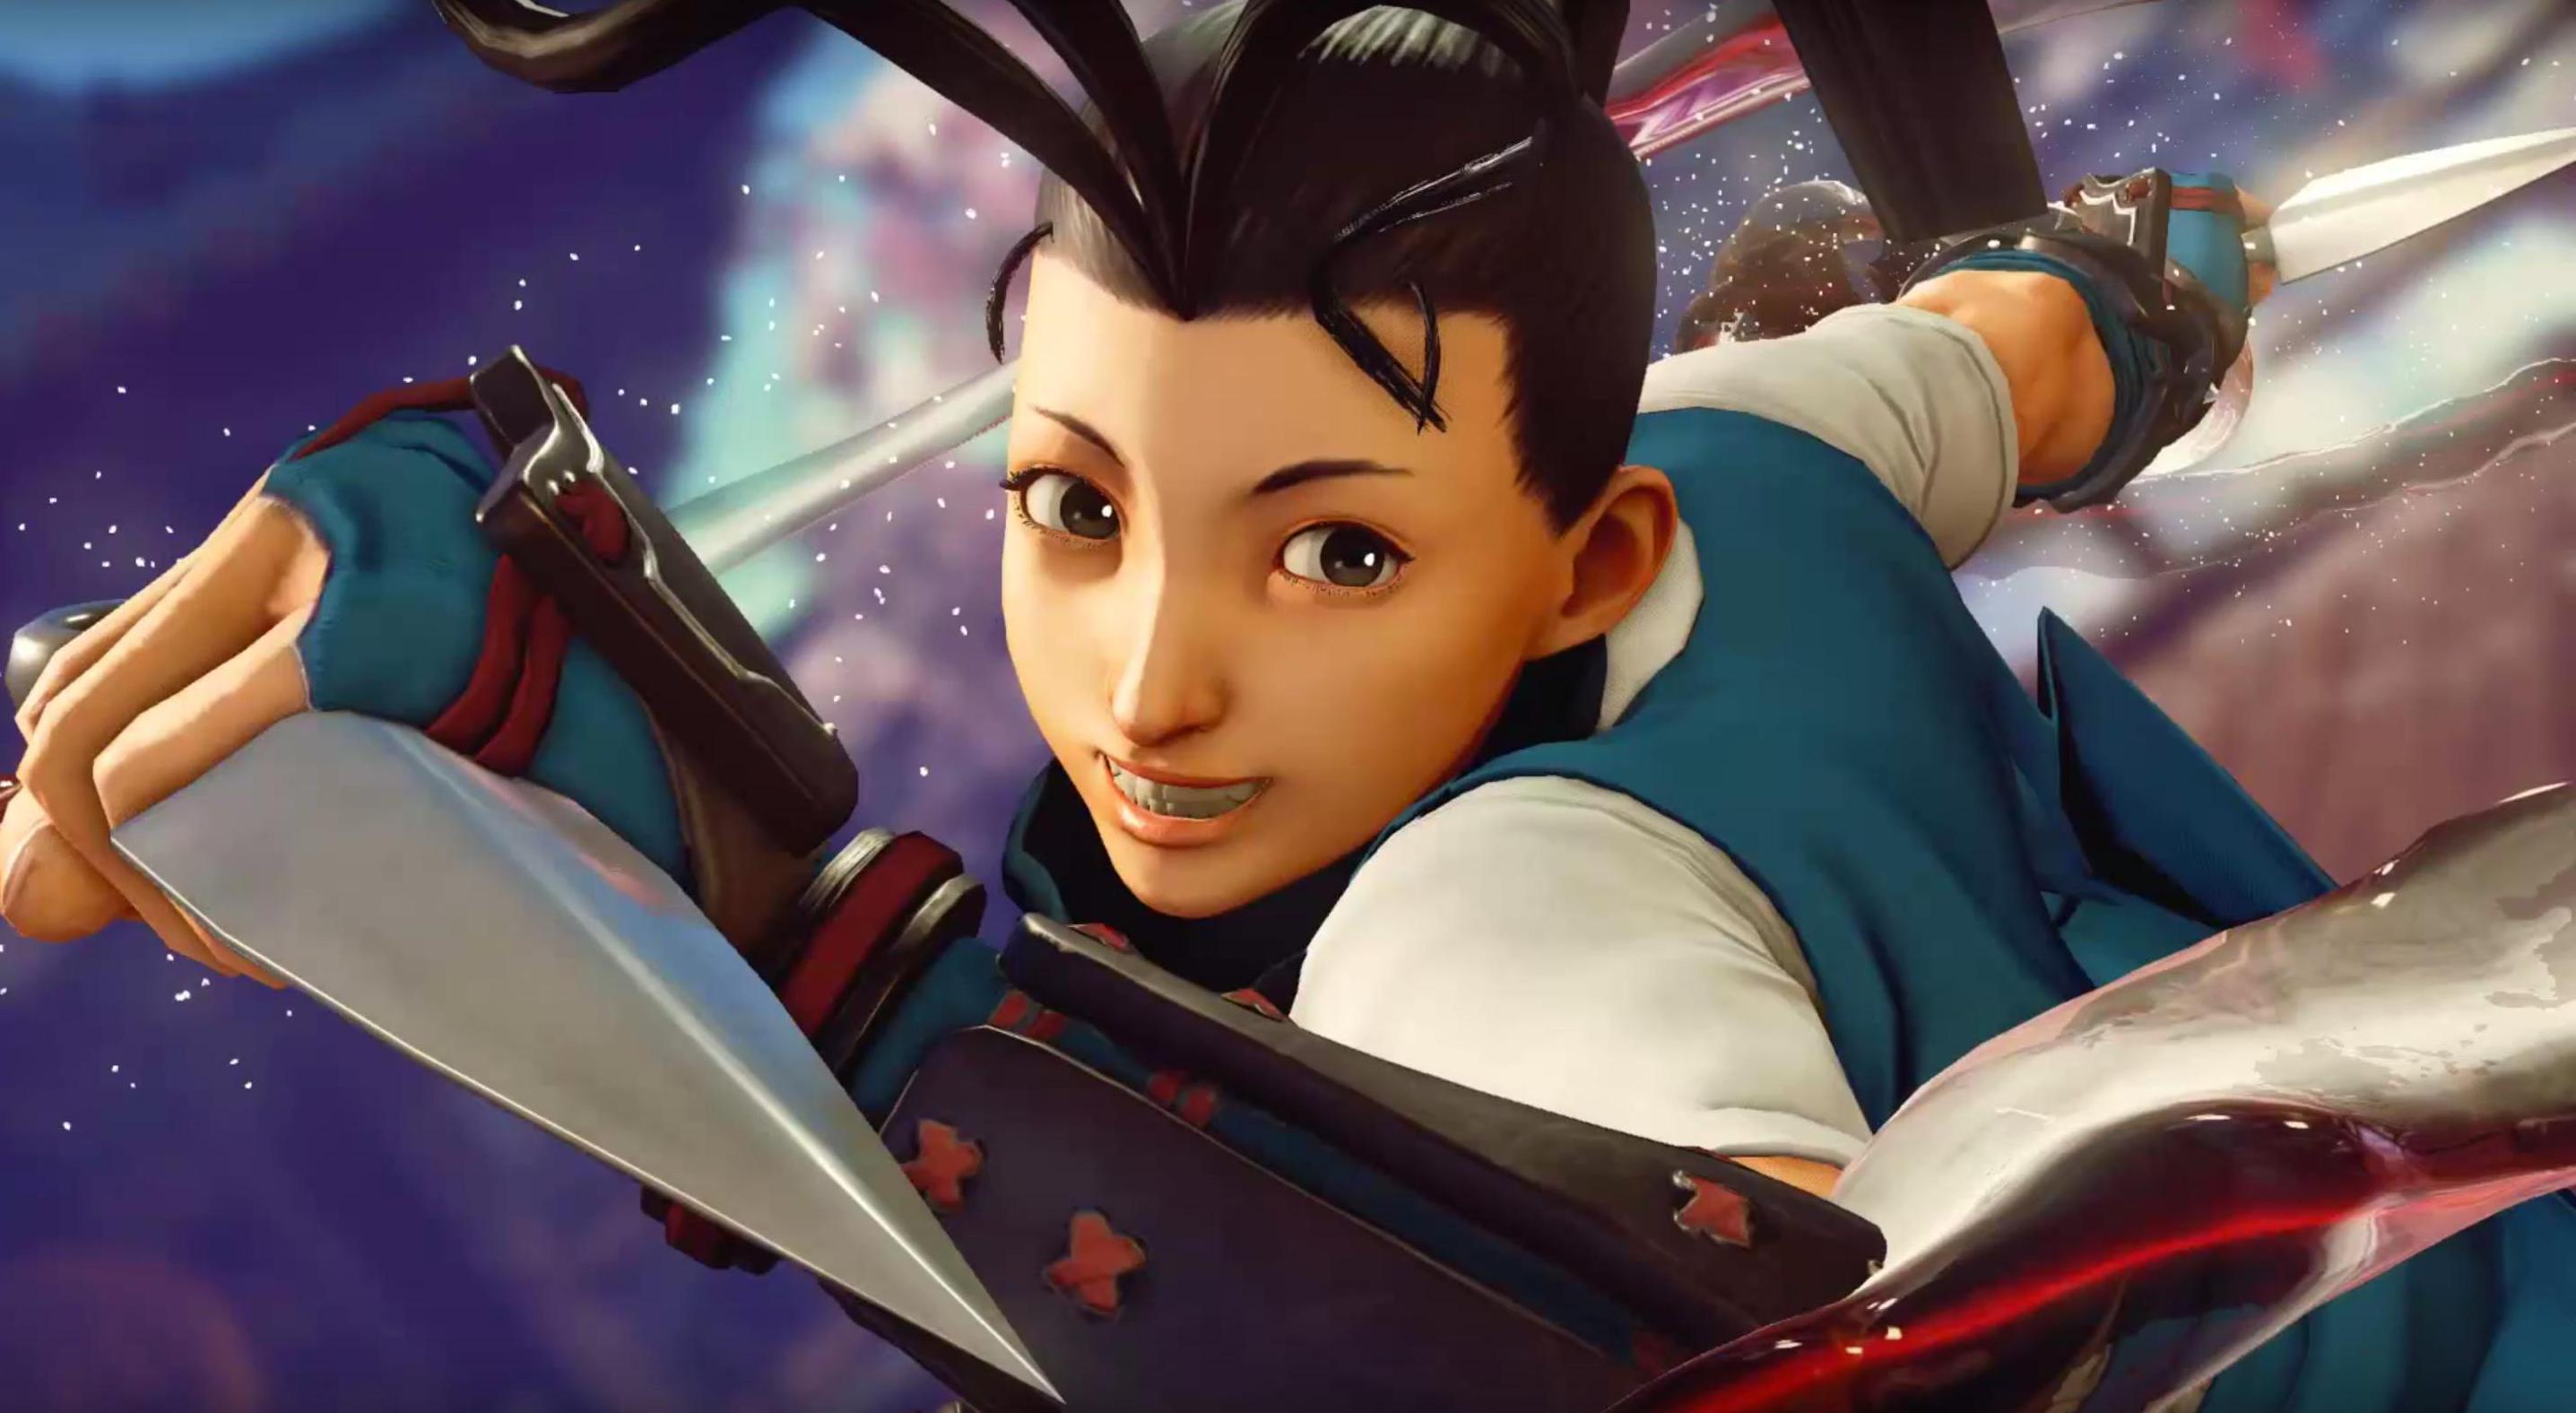 Ibuki Arrives On the Scene in Street Fighter 5